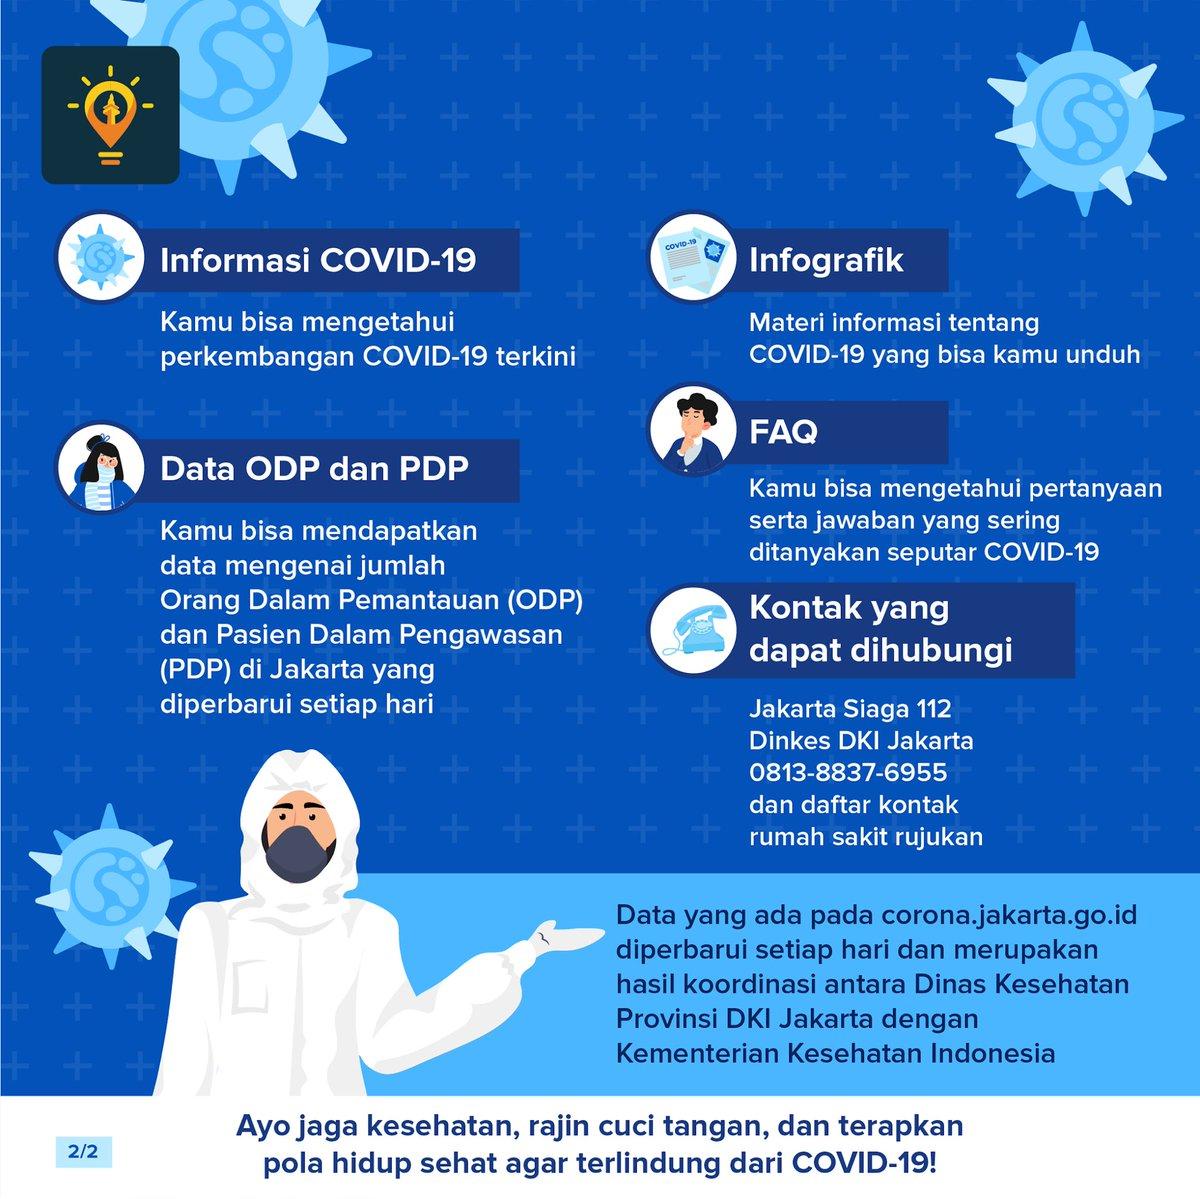 Jsclounge On Twitter Dalam Upaya Antisipasi Dan Waspada Virus Corona Kamu Bisa Memantau Informasi Terkini Covid 19 Melalui Https T Co Mrwhnloija Melalui Microsite Tersebut Kamu Dapat Memperoleh Berbagai Informasi Perkembangan Dan Pengetahuan